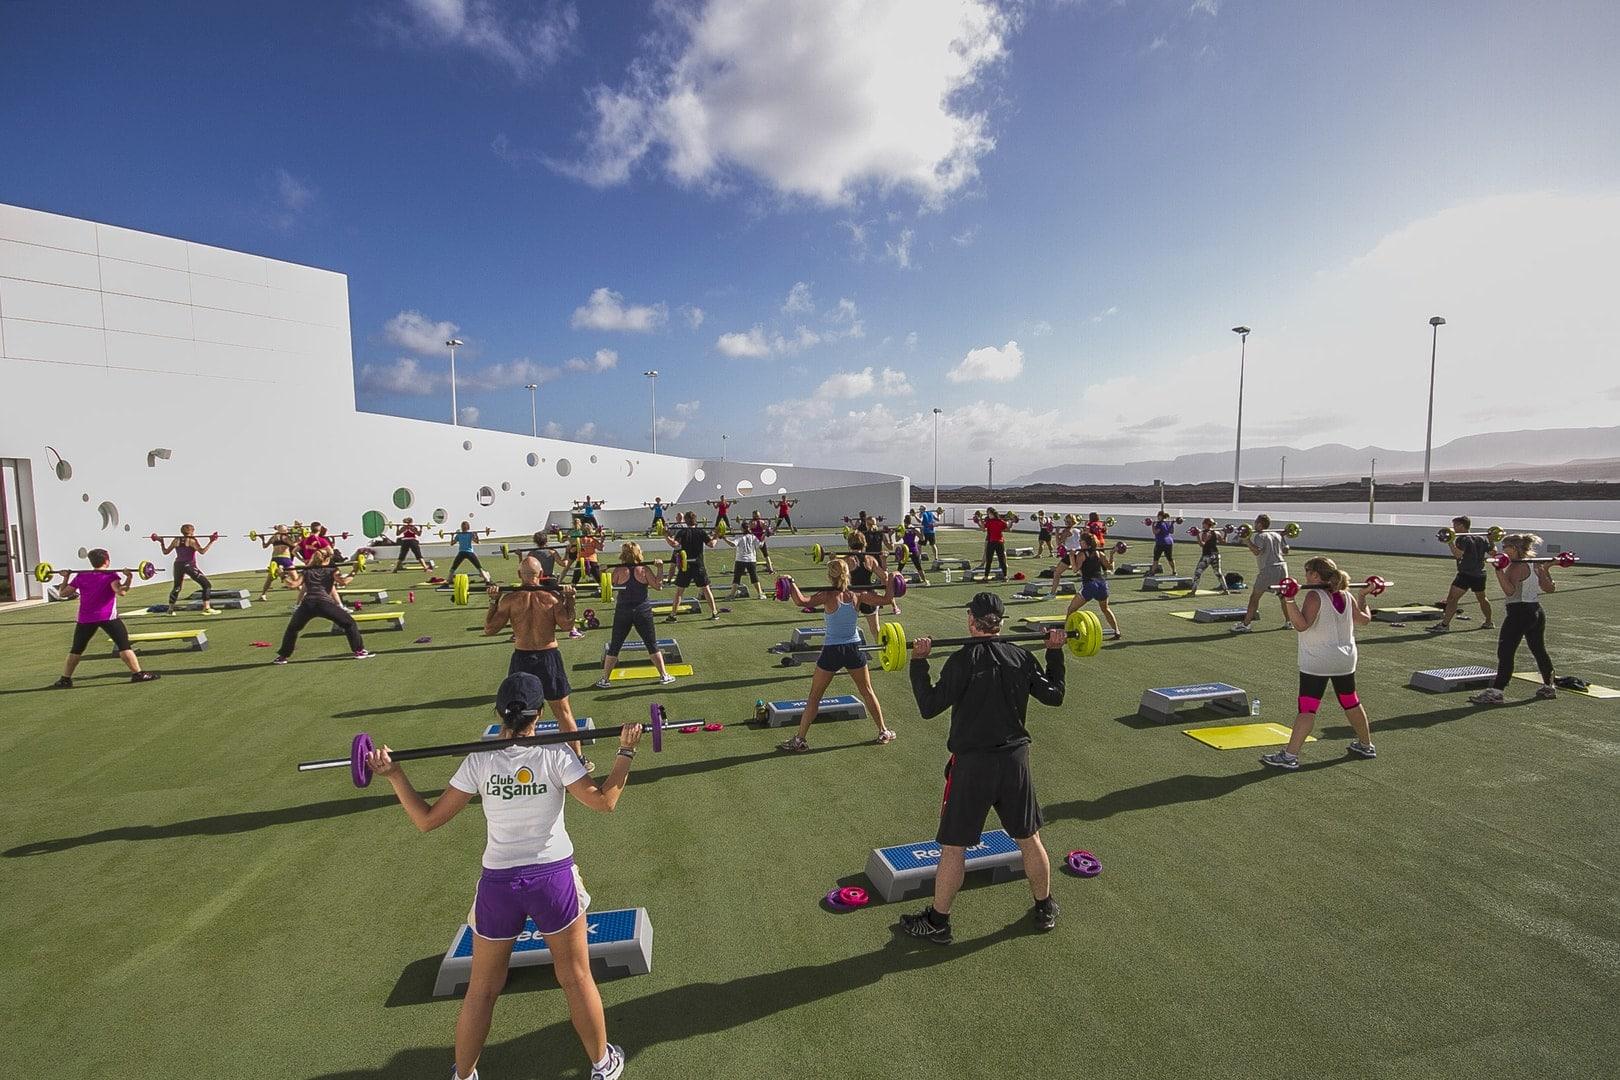 club-la-santa-aktivrejse-studietur-alfa-travel-fitness